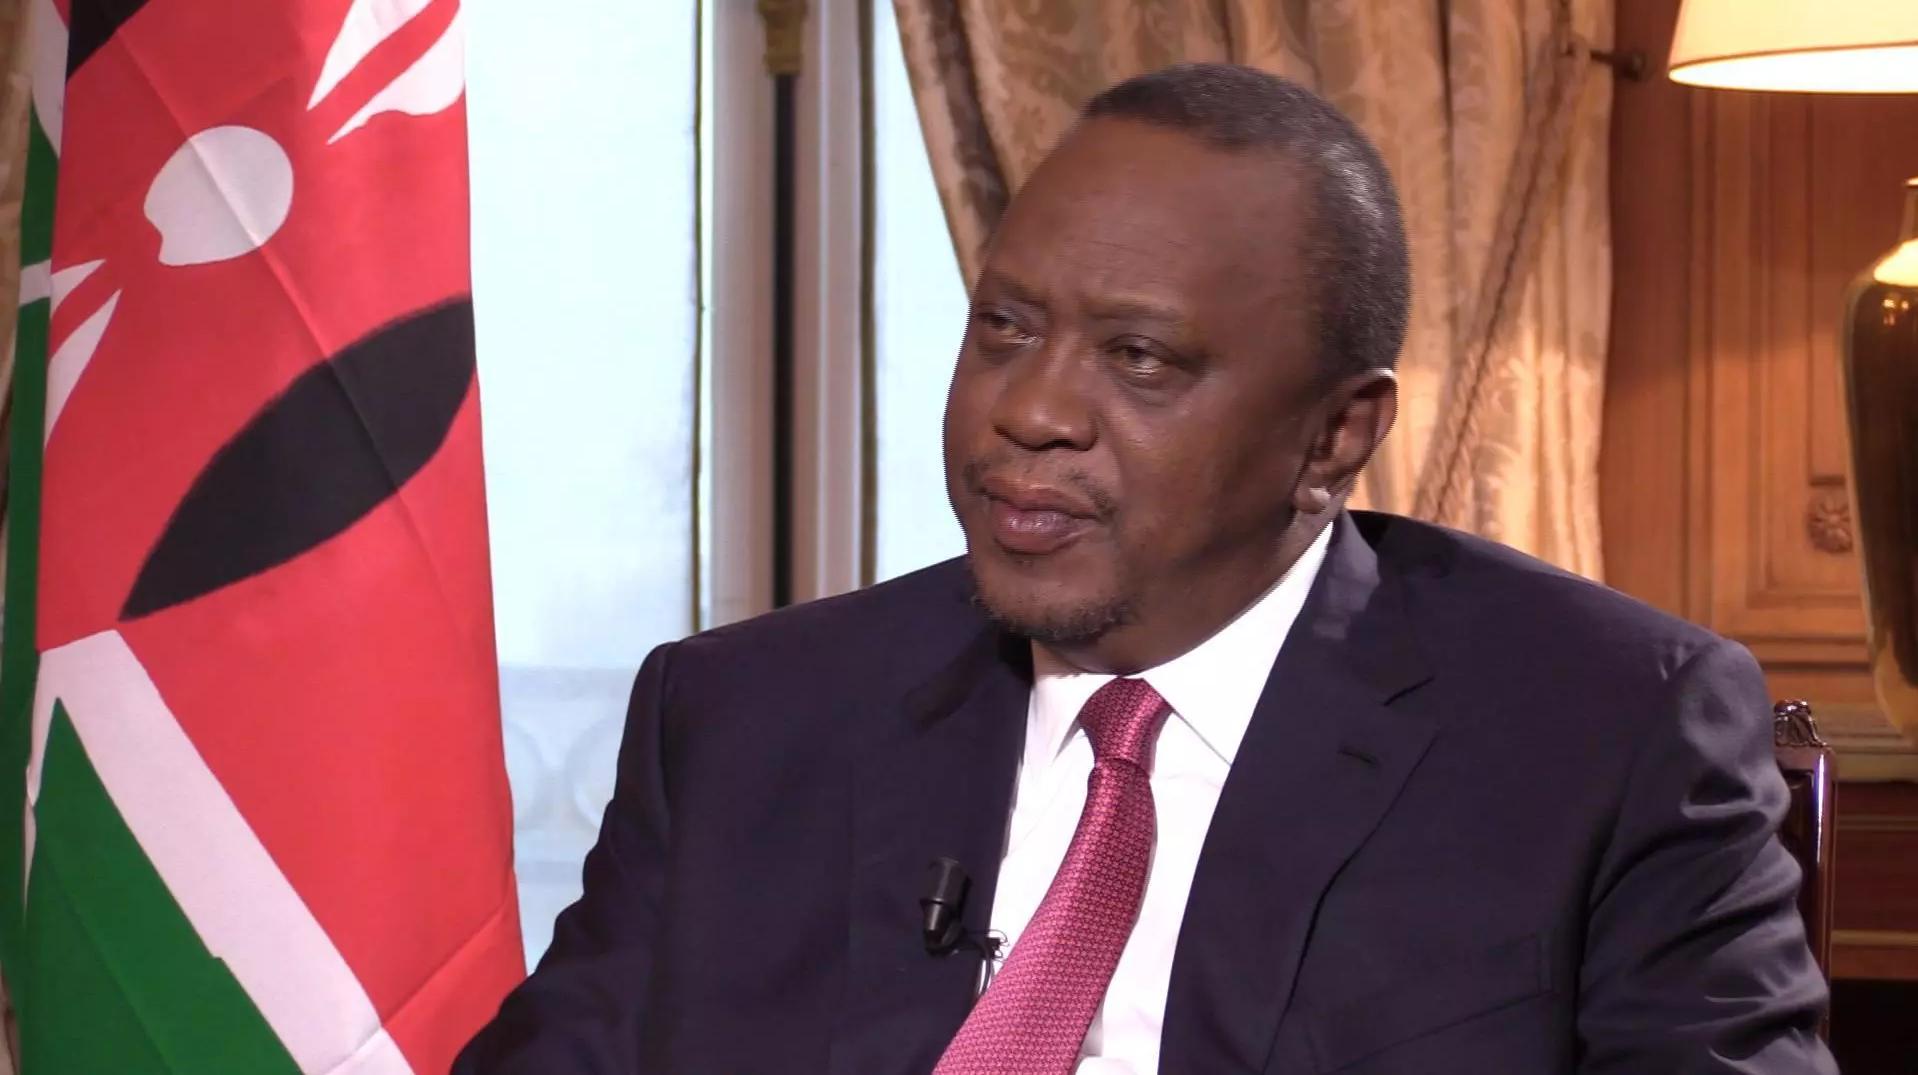 2020-10-01 kenya president uhuru kenyatta interview france 24 screenshot